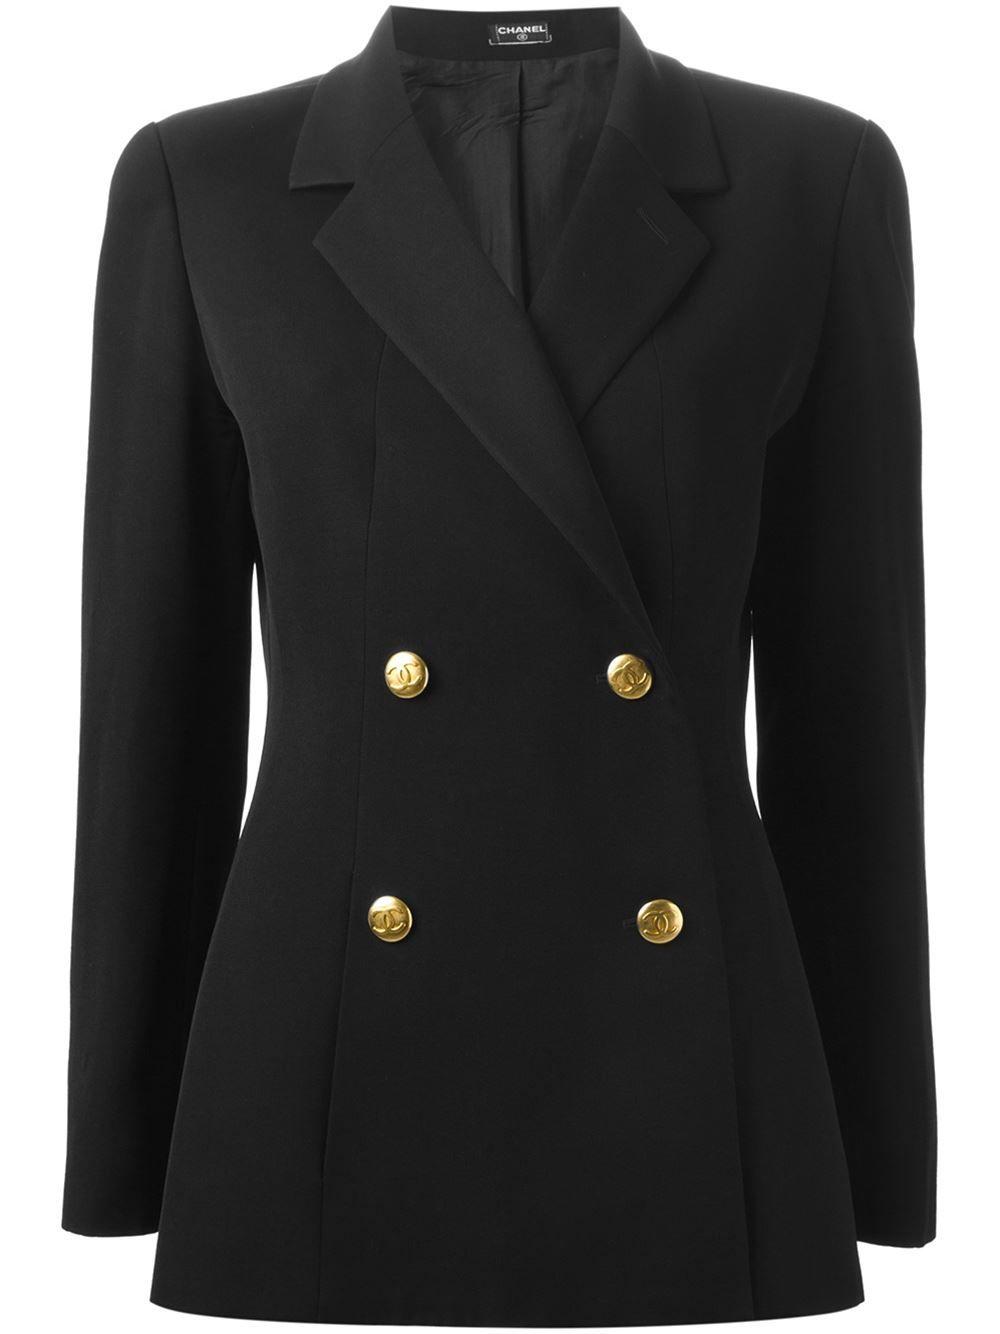 4bd742259d0 Chanel Vintage Double Breasted Blazer - Katheleys Vintage - Farfetch ...